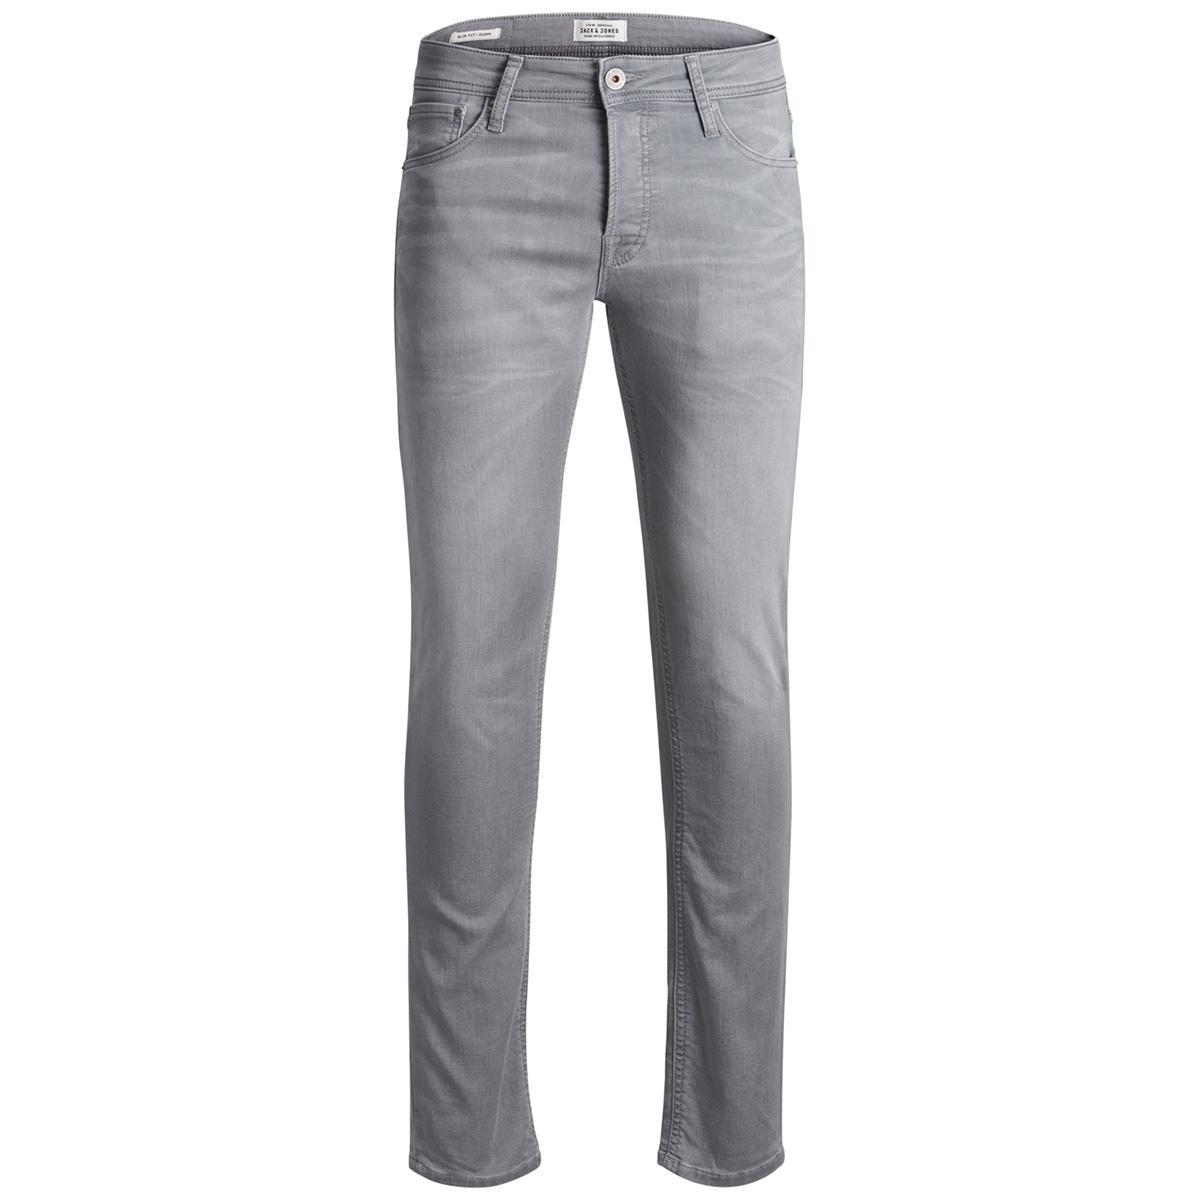 jjiglenn jjoriginal jos 889 indigo 12137660 jack & jones jeans grey denim